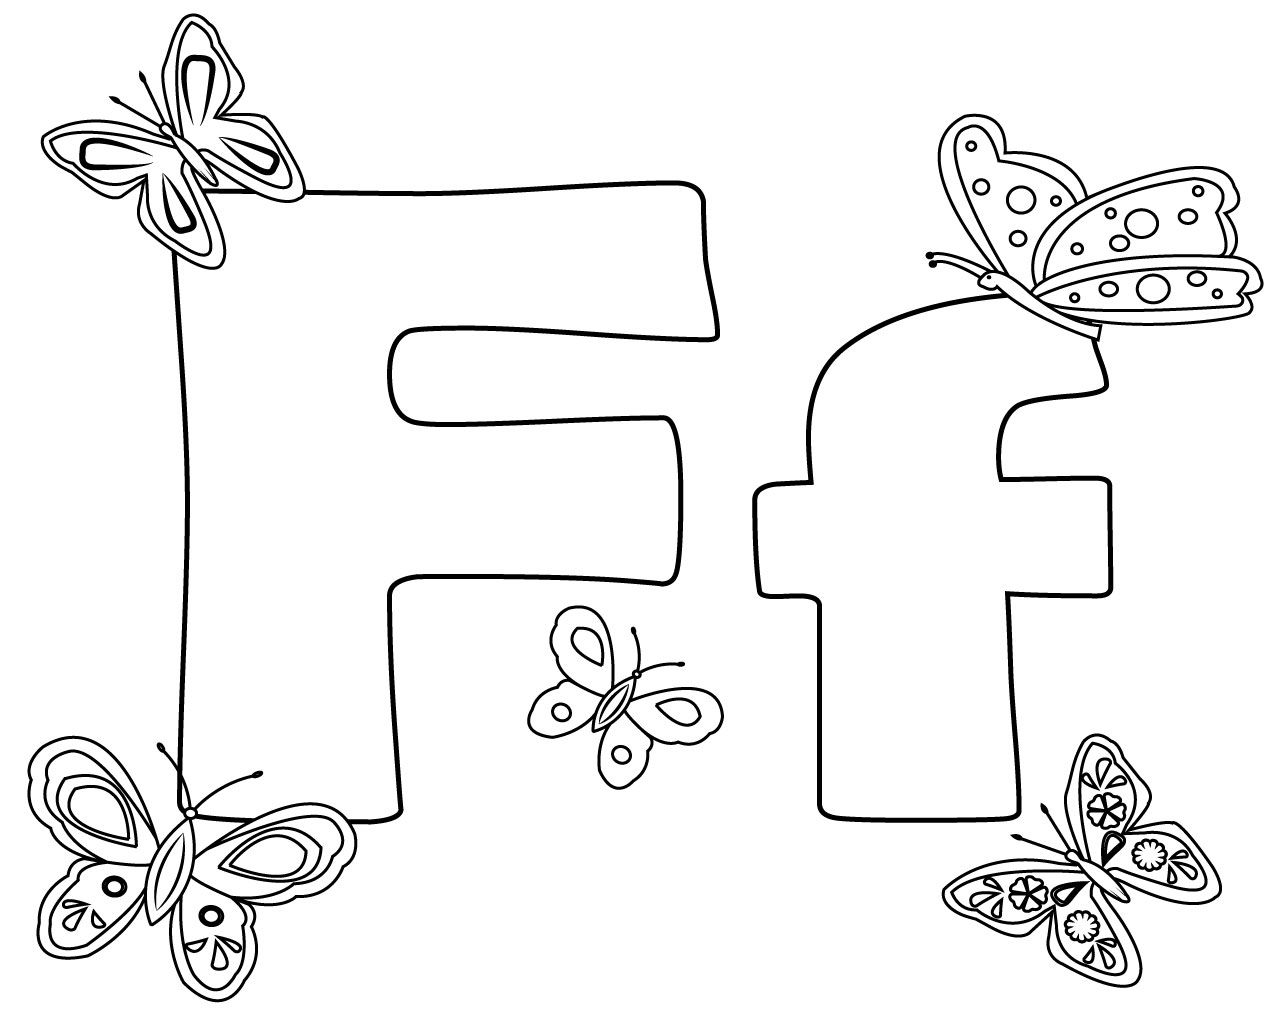 f coloring pages for preschoolers | Alphabet crafts preschool ... | 1024x1280